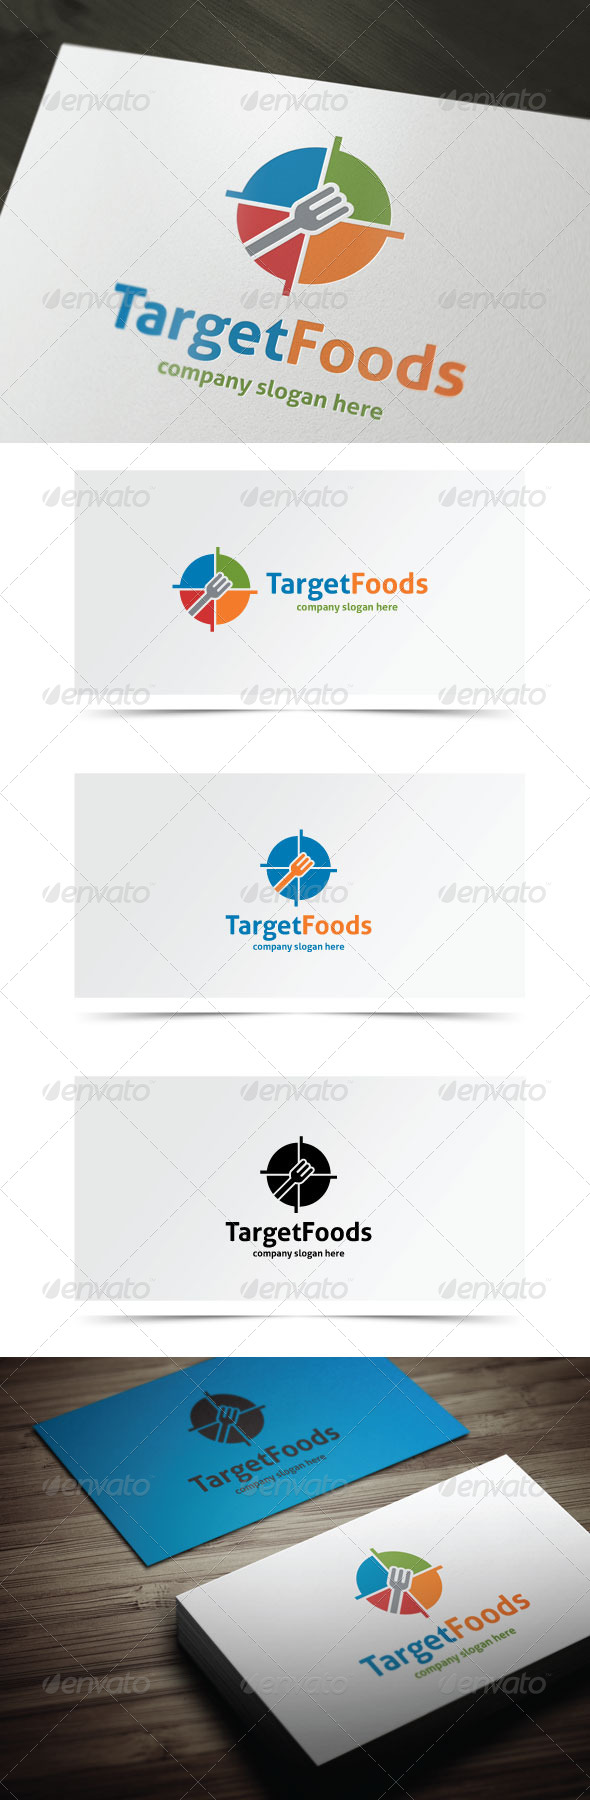 Target Foods